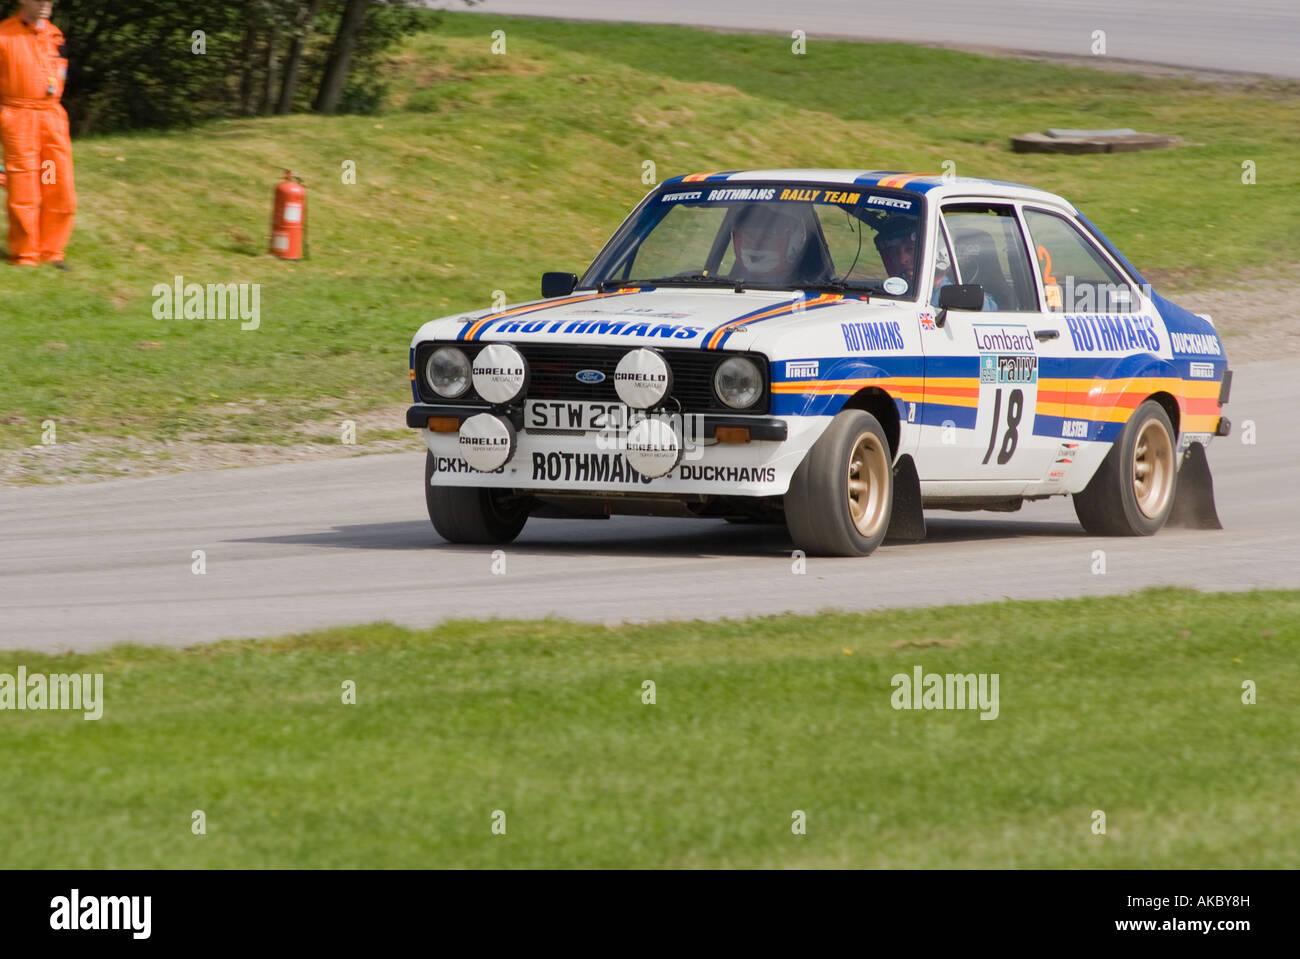 Ford Escort Mk2 Rally Car at Oulton Park Motor Racing Circuit near ...